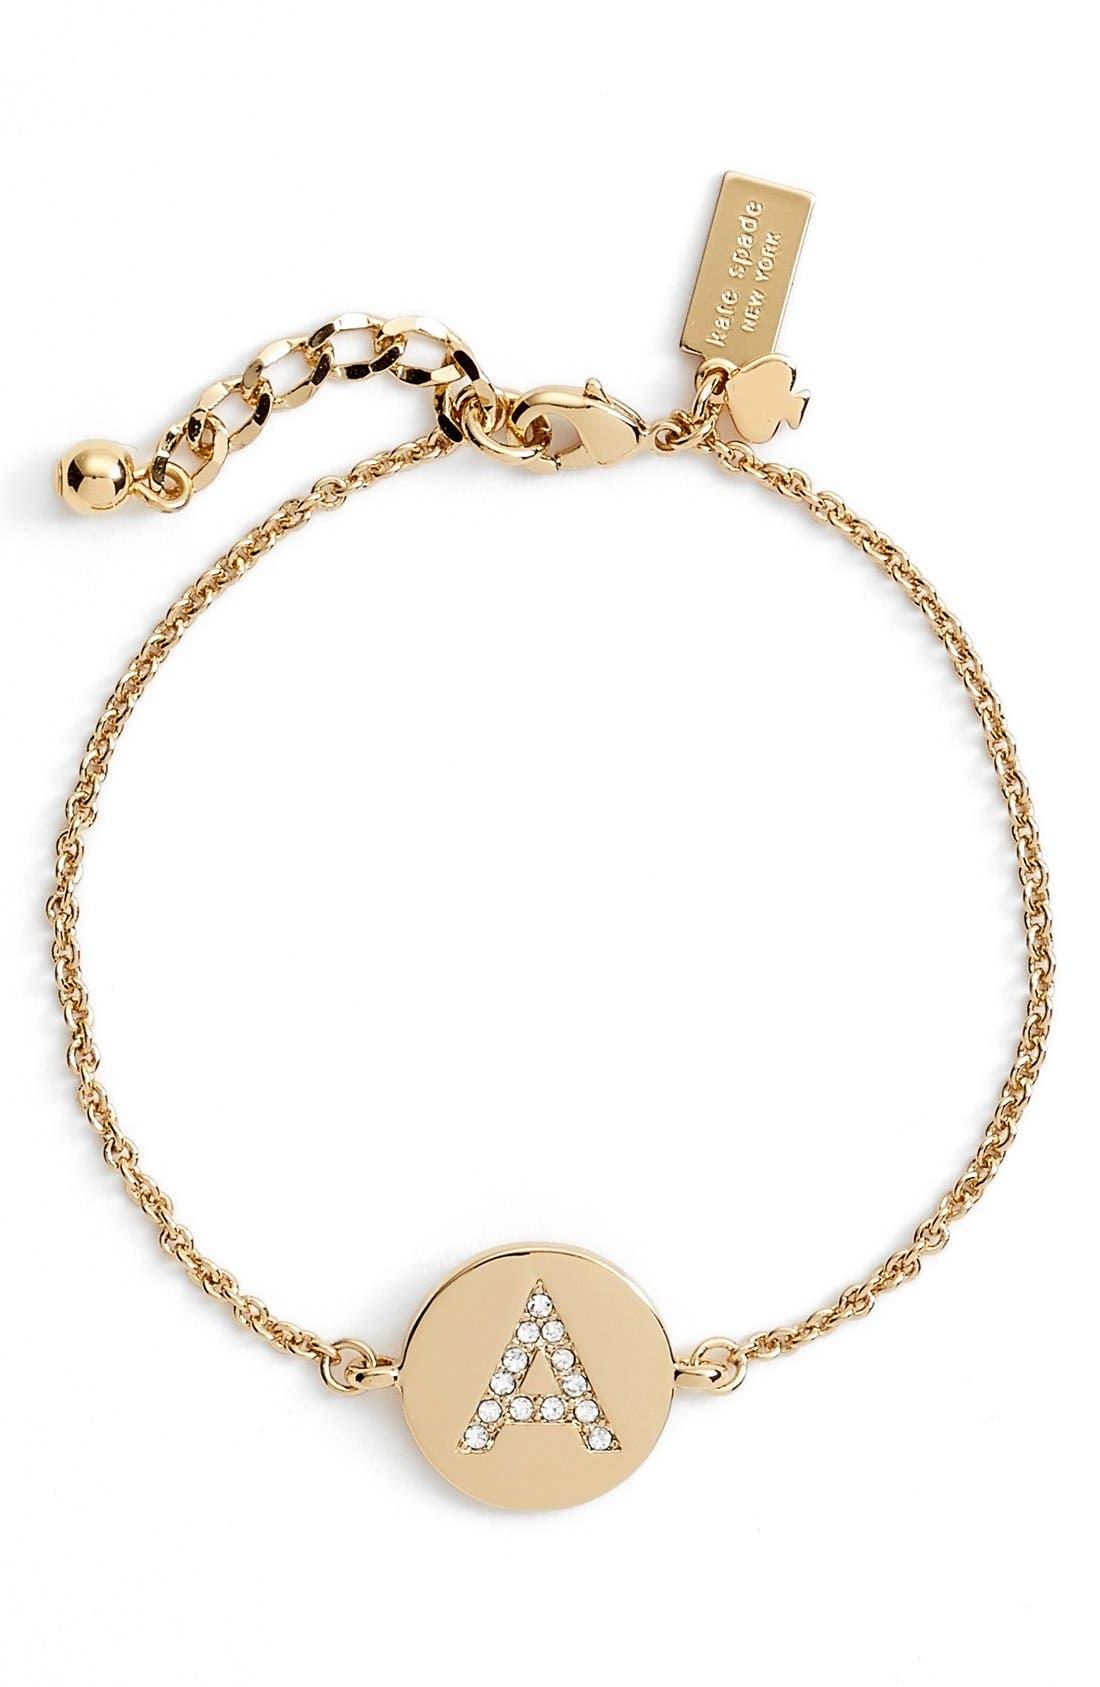 KATE SPADE NEW YORK 'north court' pavé initial charm bracelet, Main, color, 710